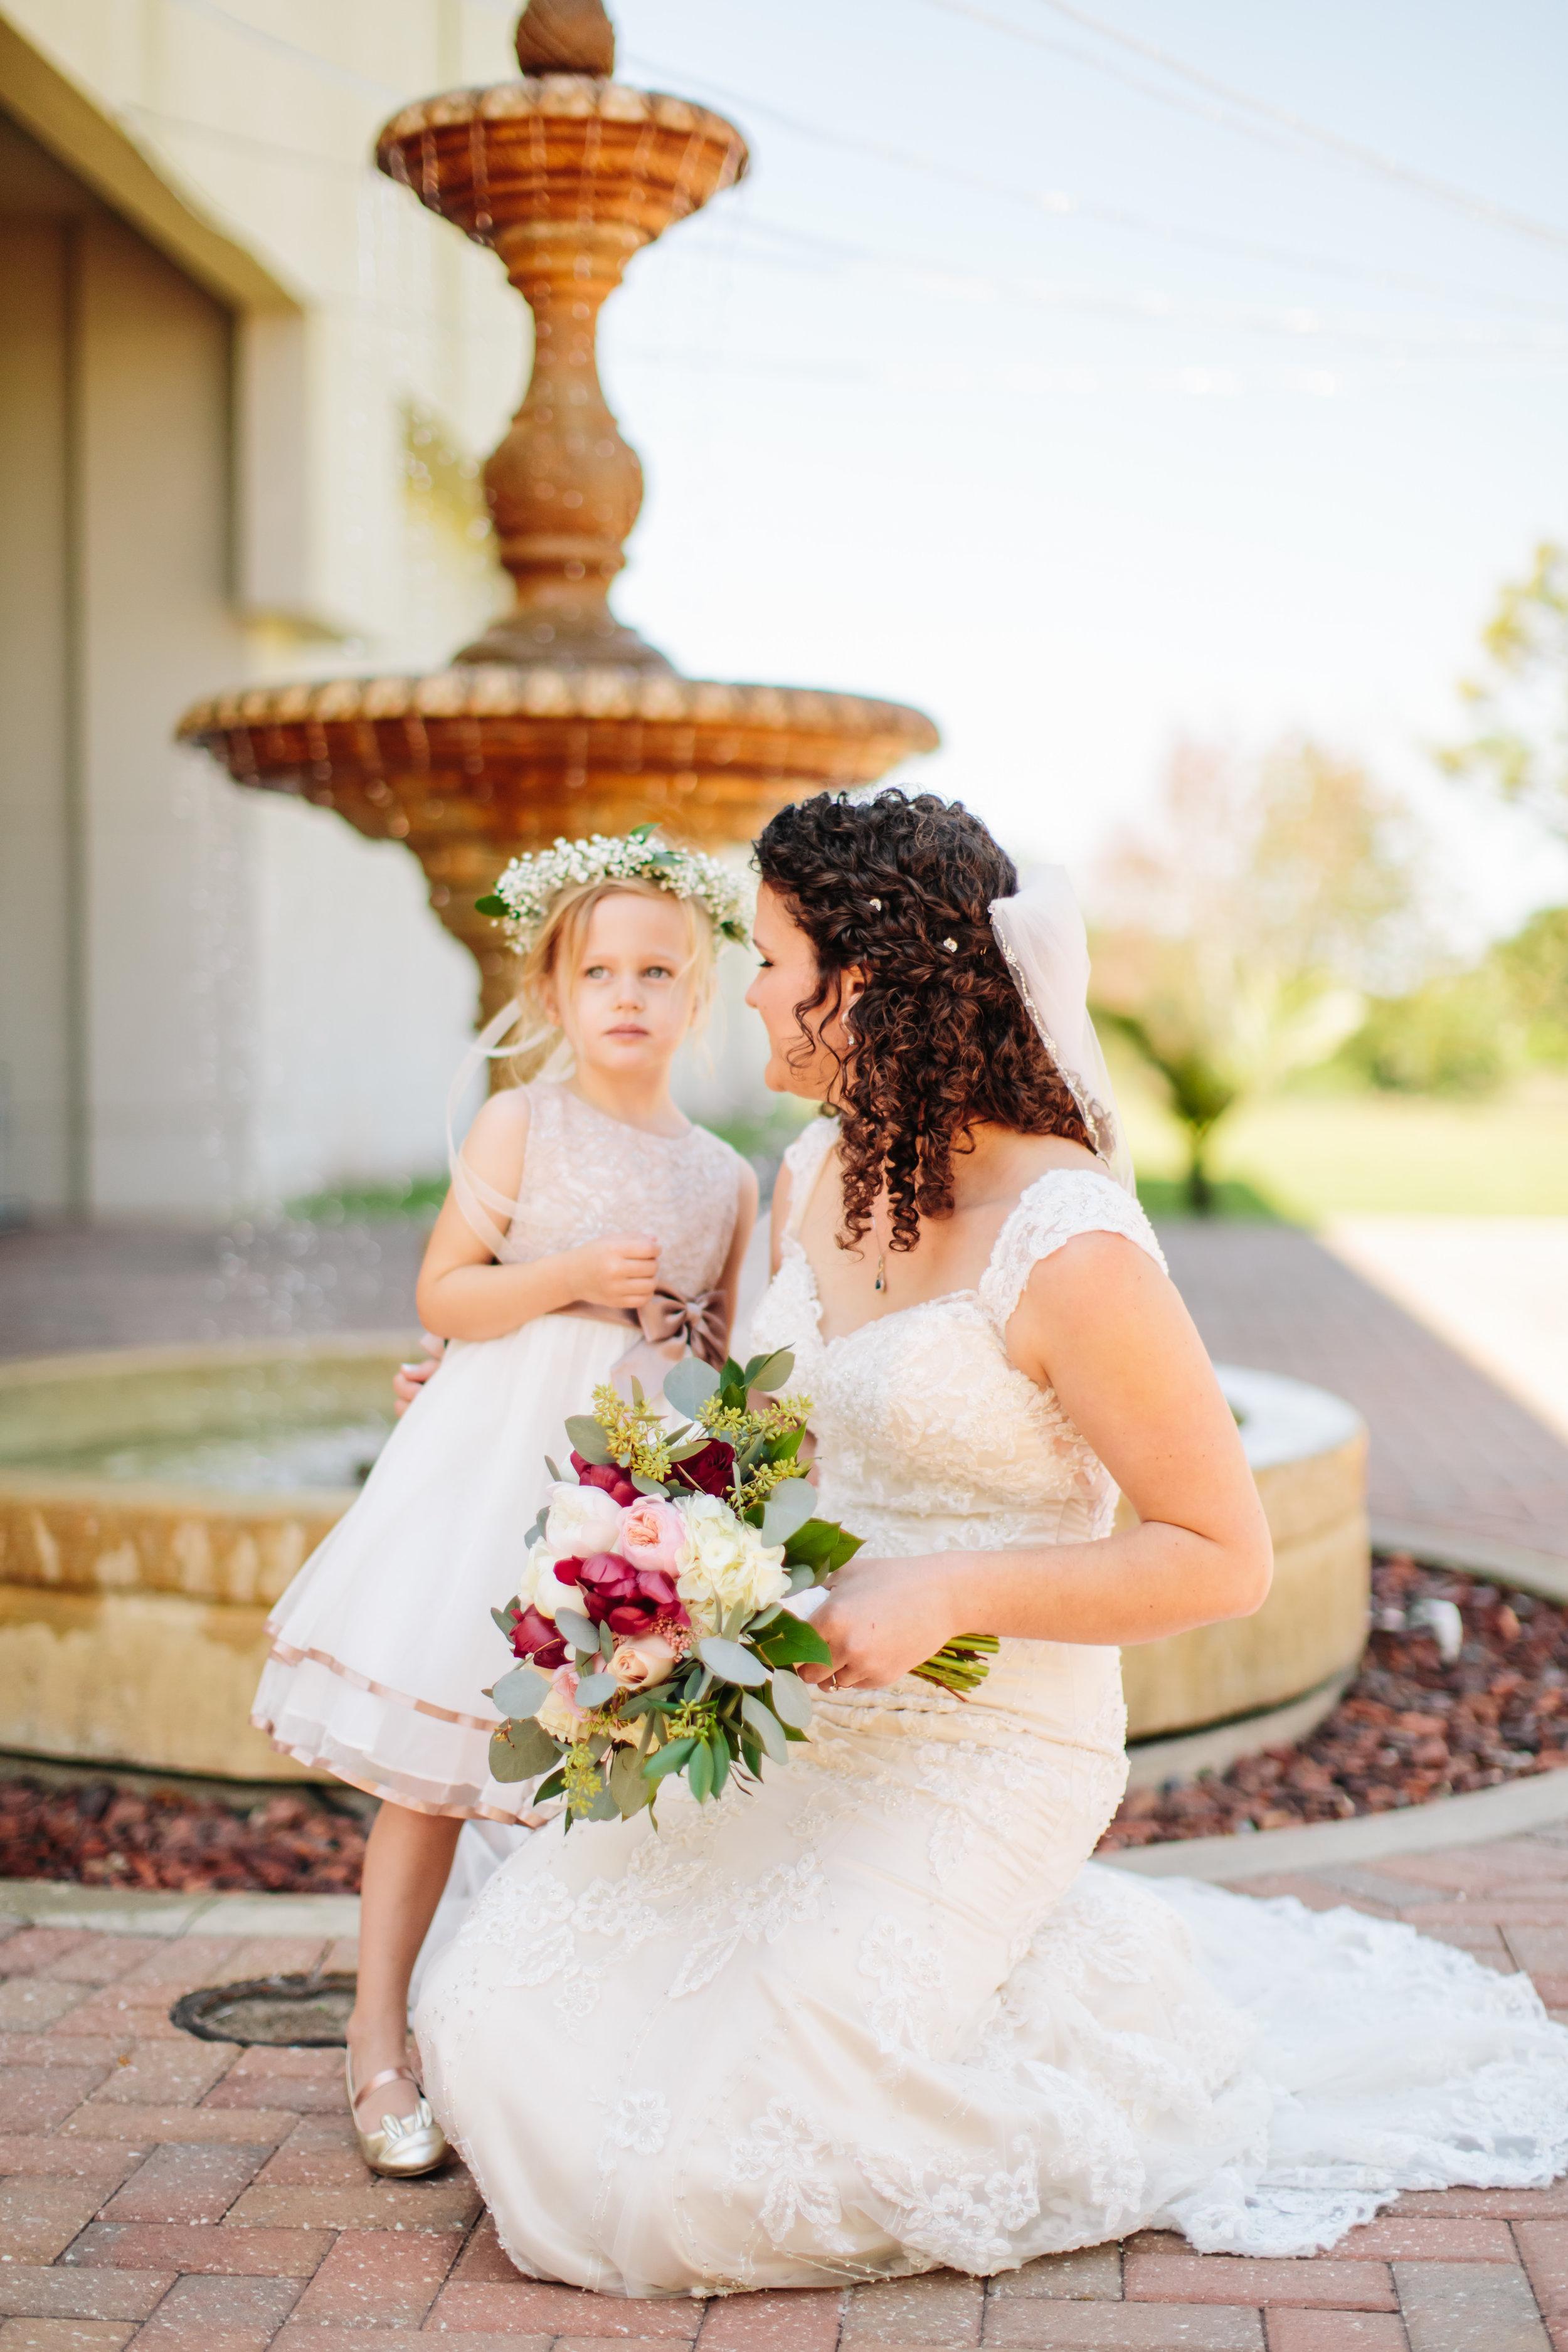 2018.03.17 Allison and Chuck Wedding Waelti Melbourne (112 of 900).jpg